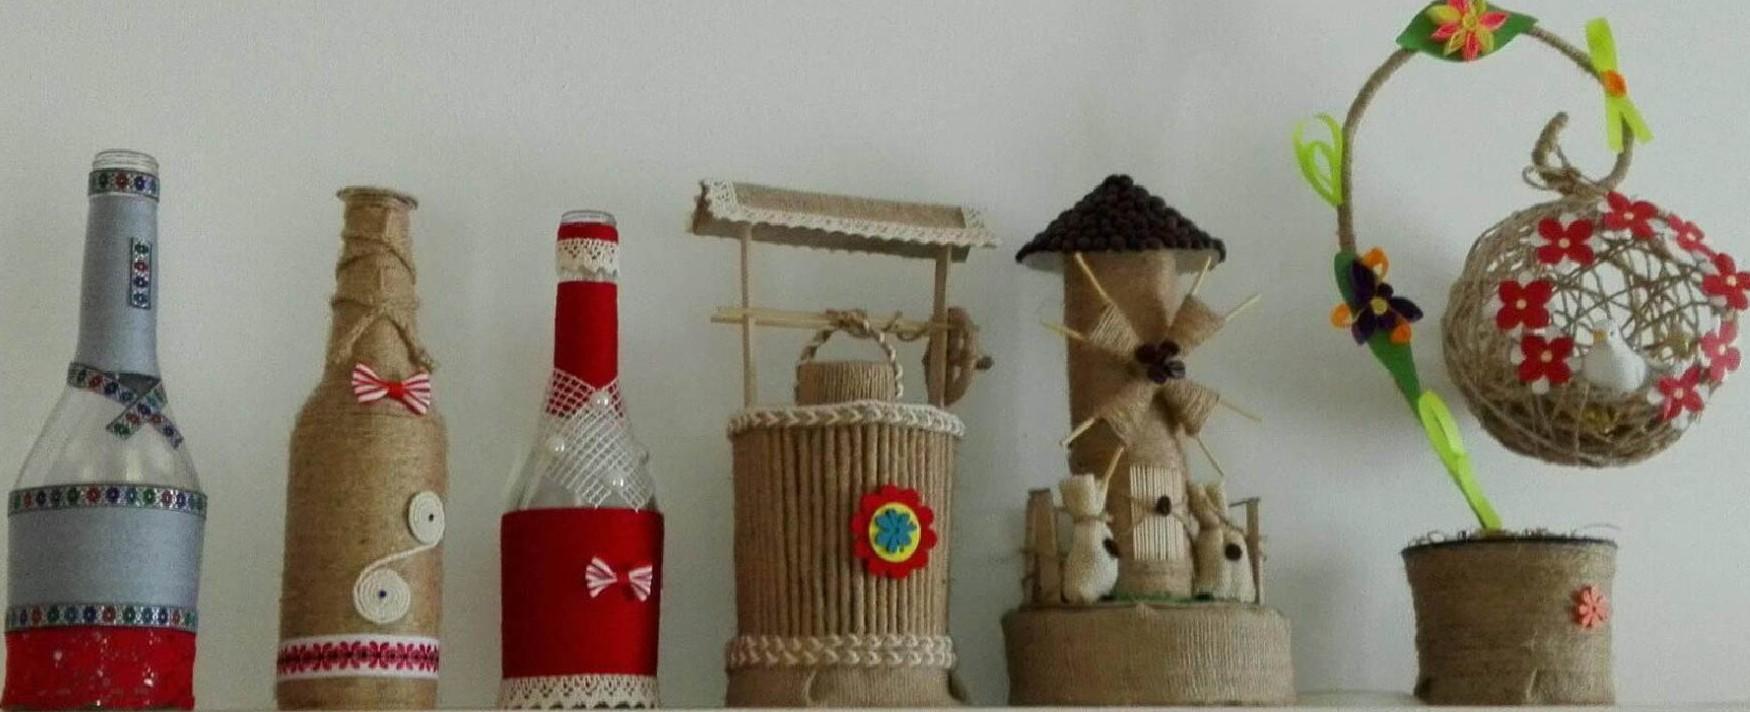 Decoratiuni artizanat